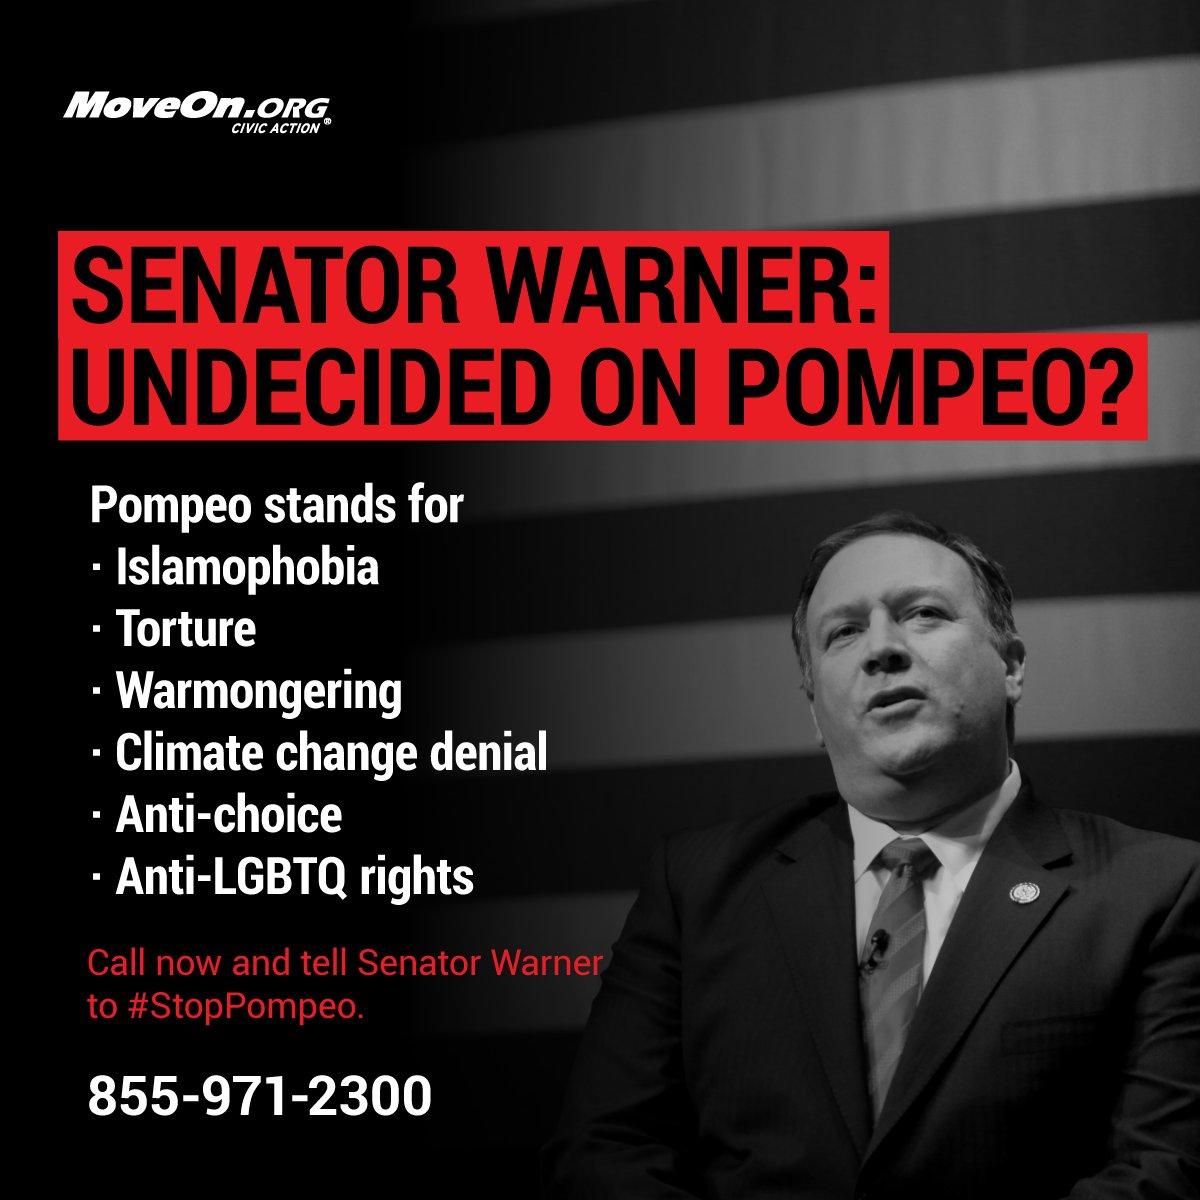 #StopPompeo. @MarkWarner the American people demand better than @realDonaldTrump's #SecOfState nominee. NO anti-Muslim bigot,, water boarders = patriots, Islamophobic rhetoric, attacks #LGBTQ, NO abortion access for rape victims... as chief U.S. diplomat.